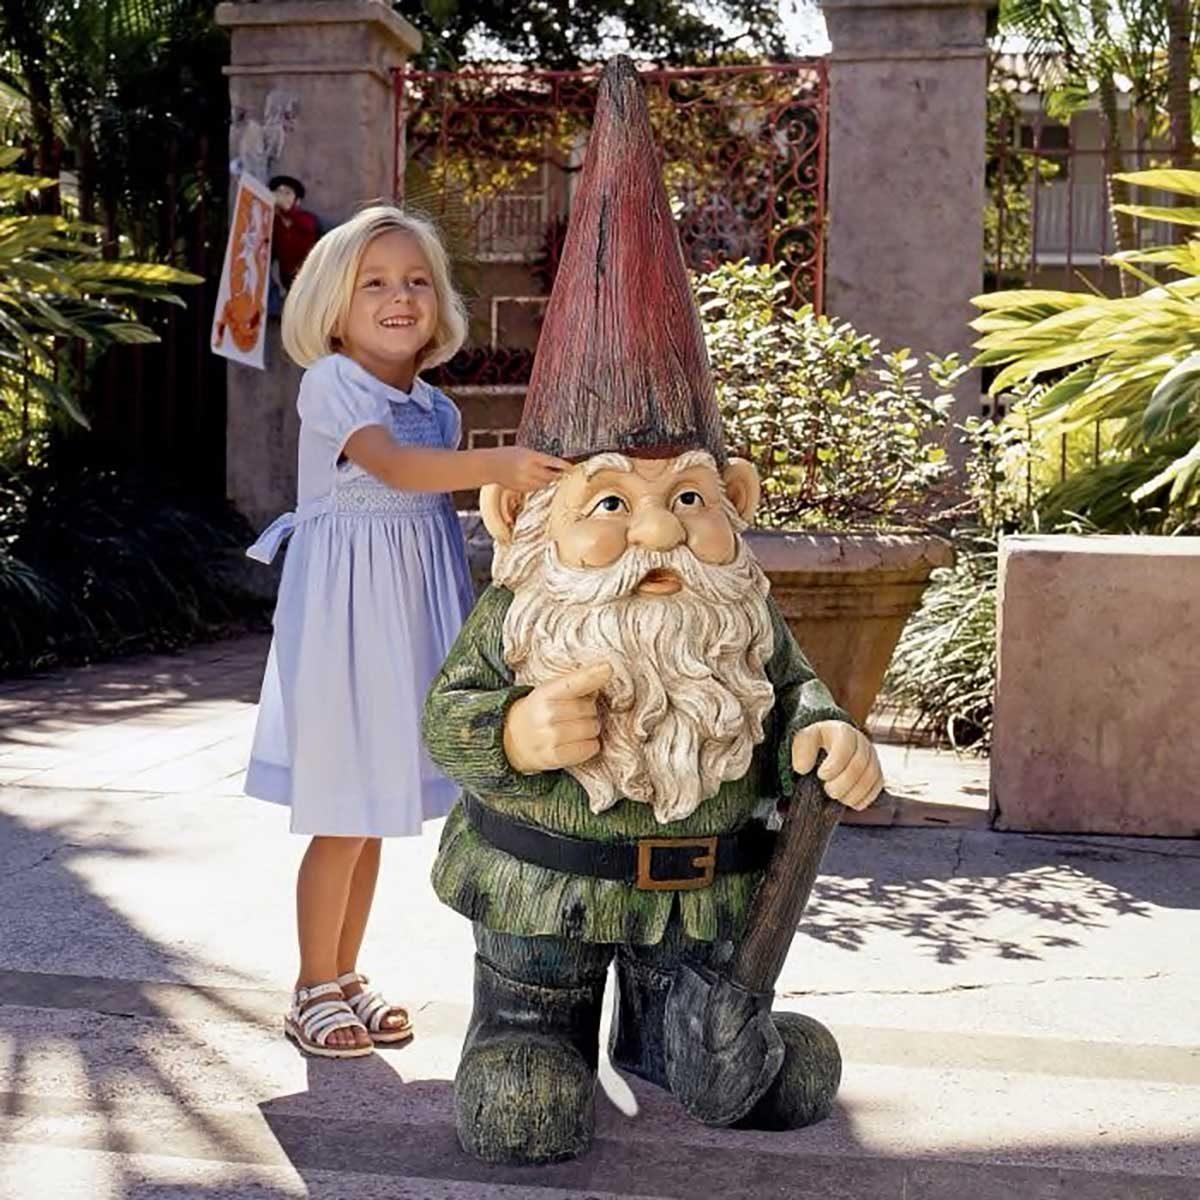 Large garden gnome